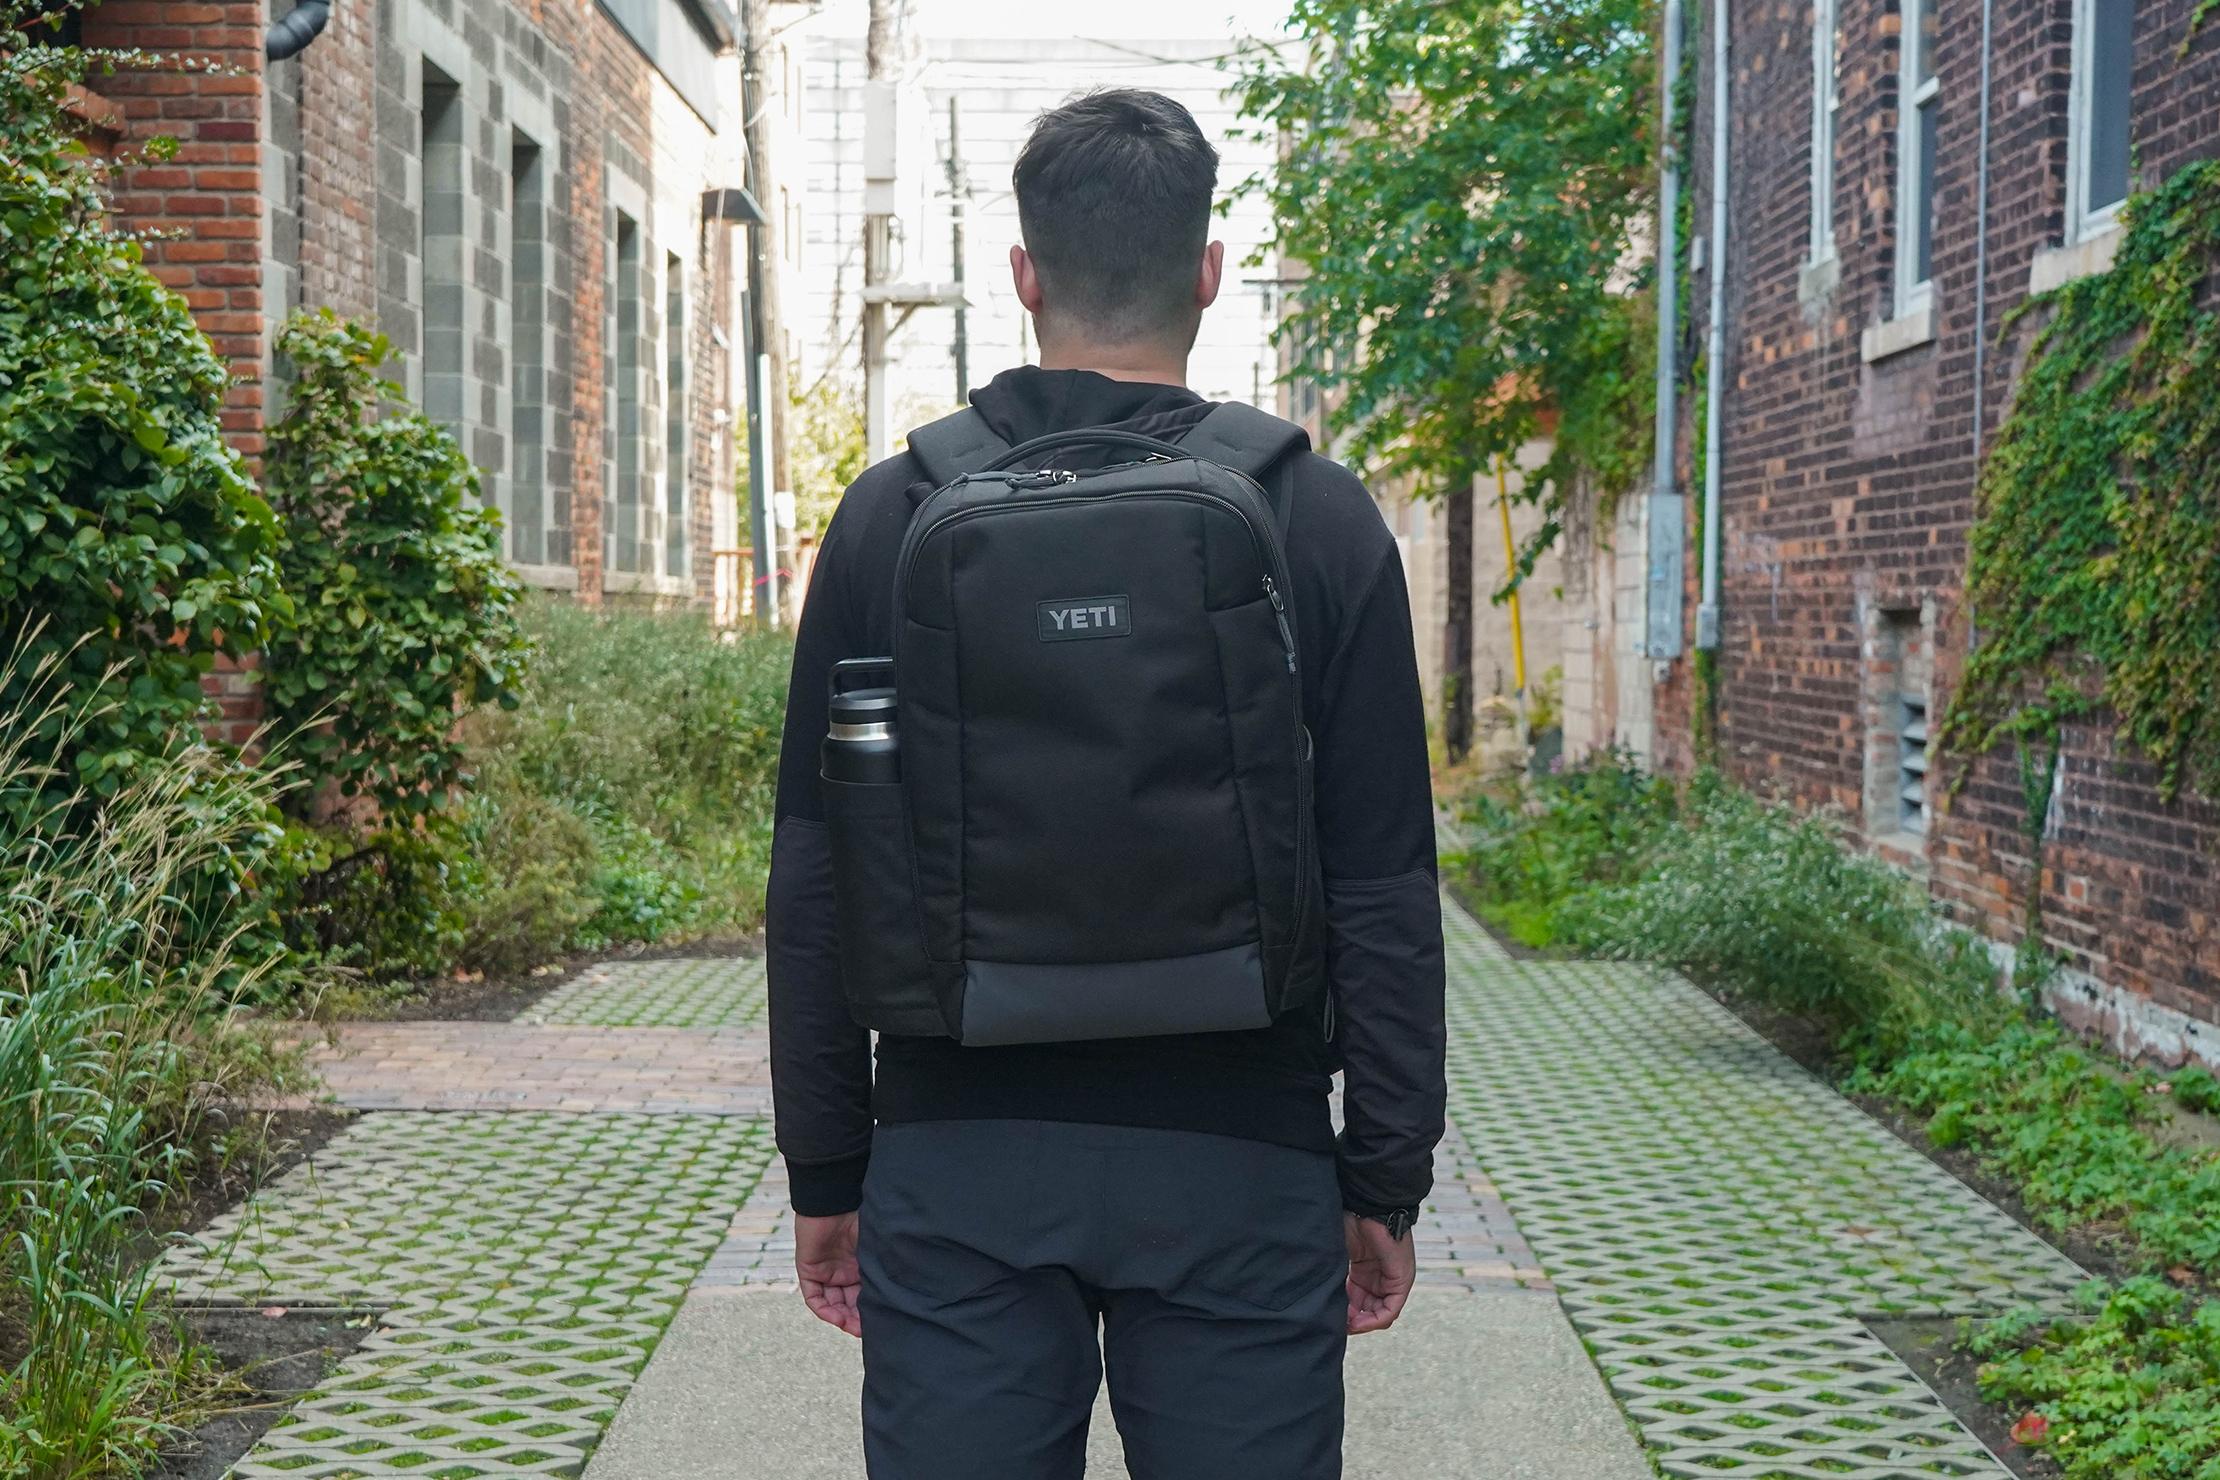 YETI Crossroads Backpack 23 In Detroit